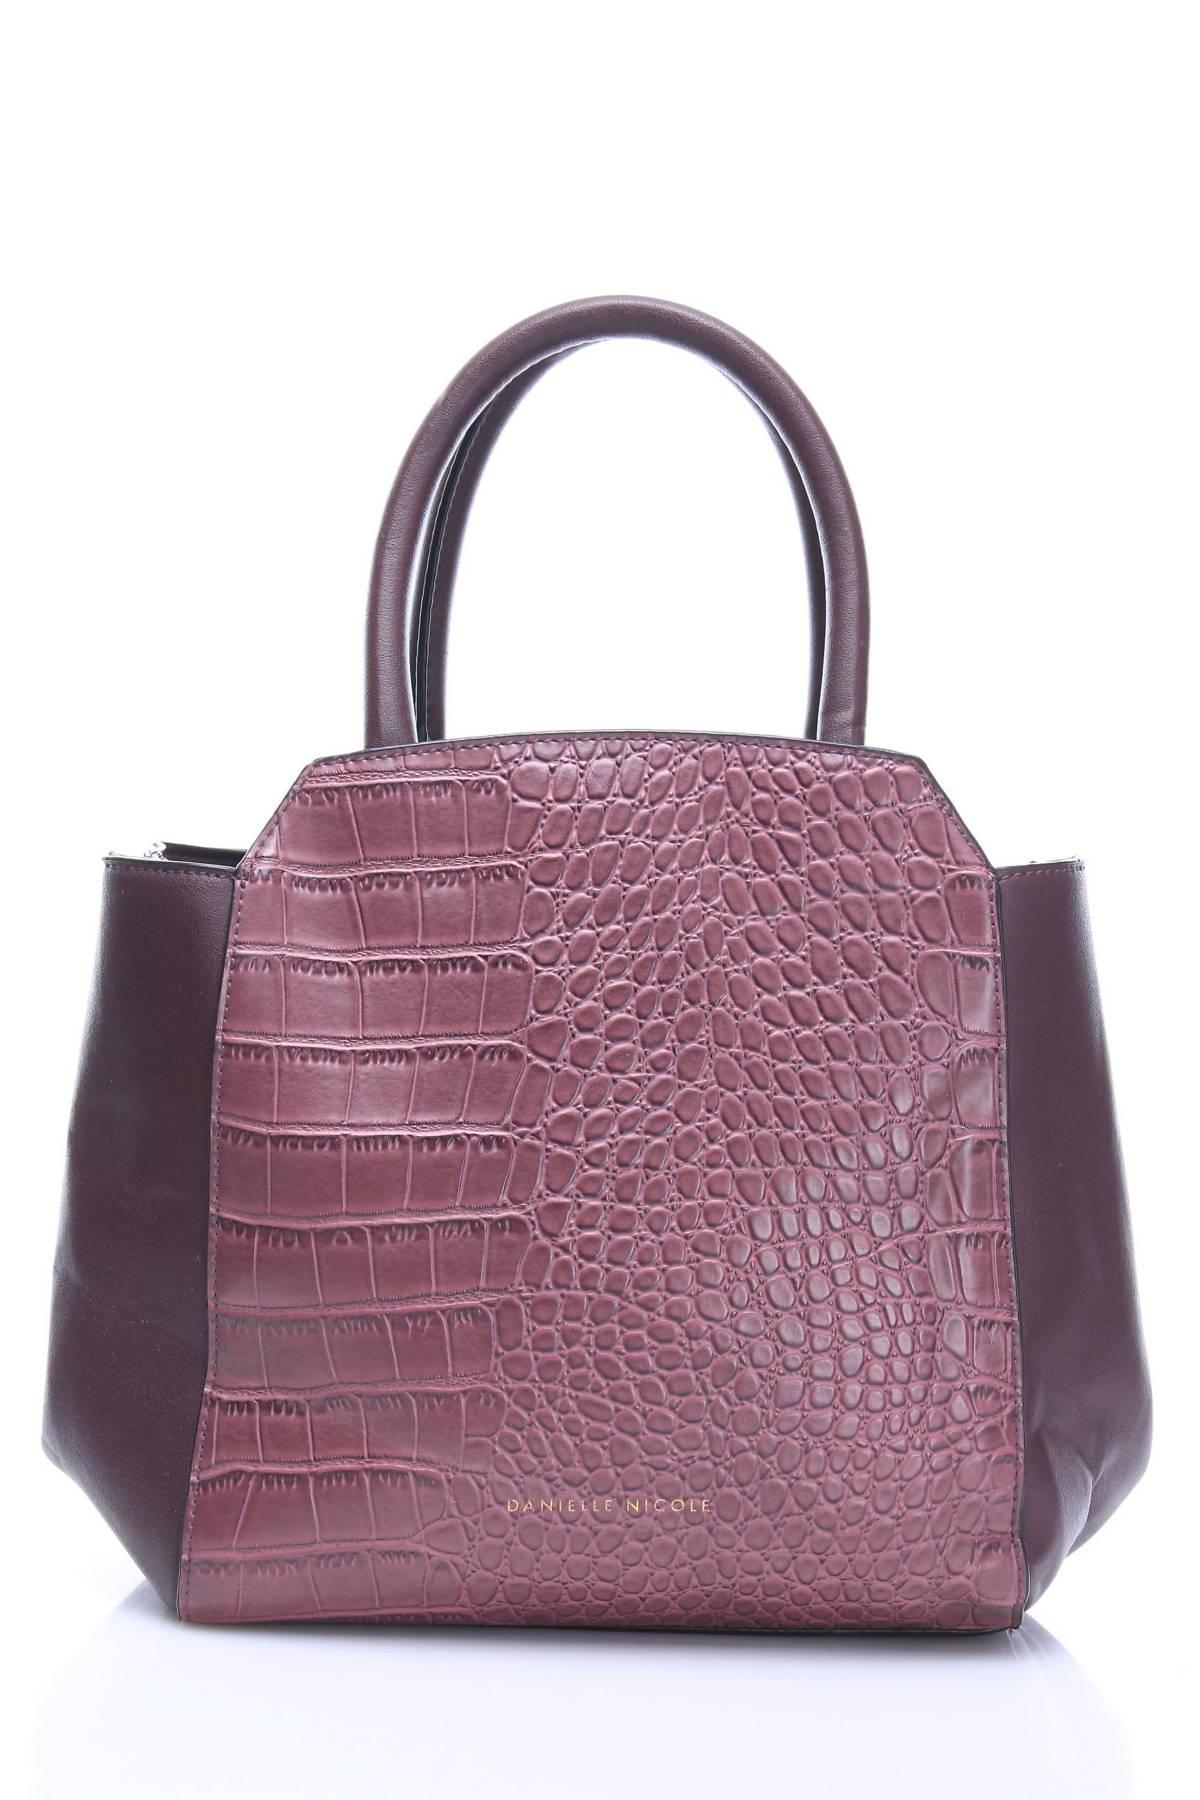 Дамска кожена чанта Danielle Nicole2